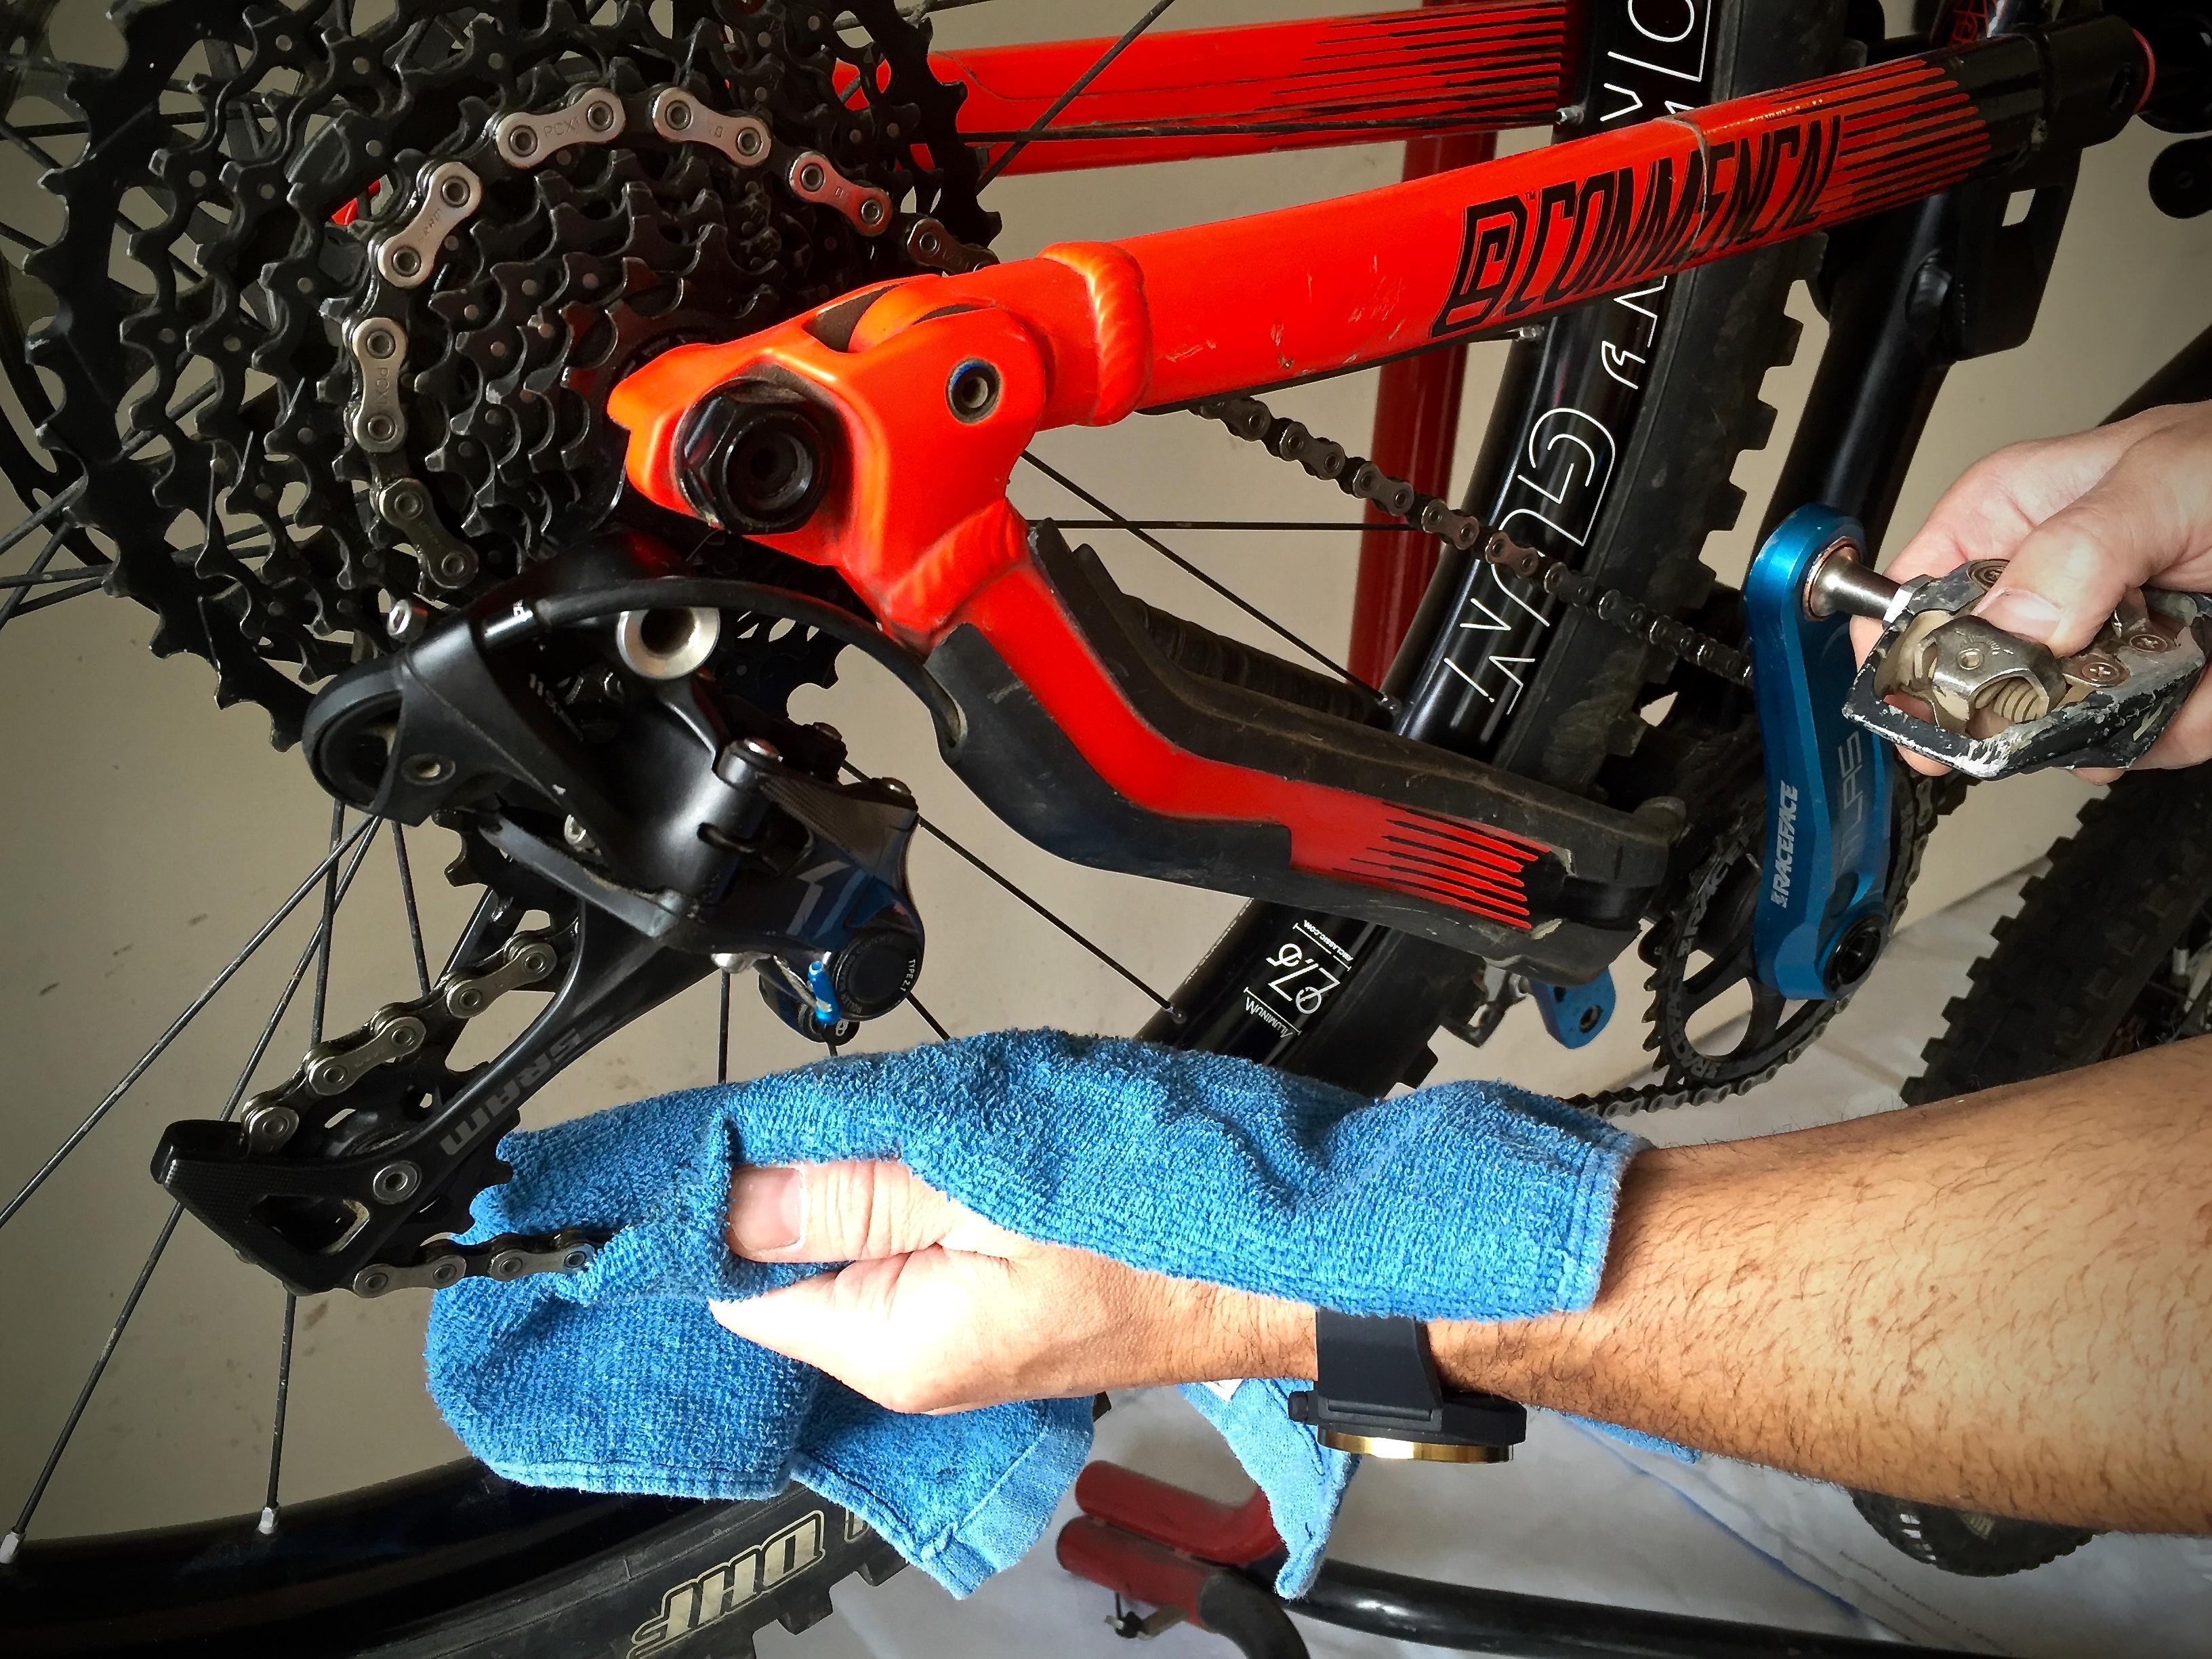 Best Dry Lube For Bike Chain